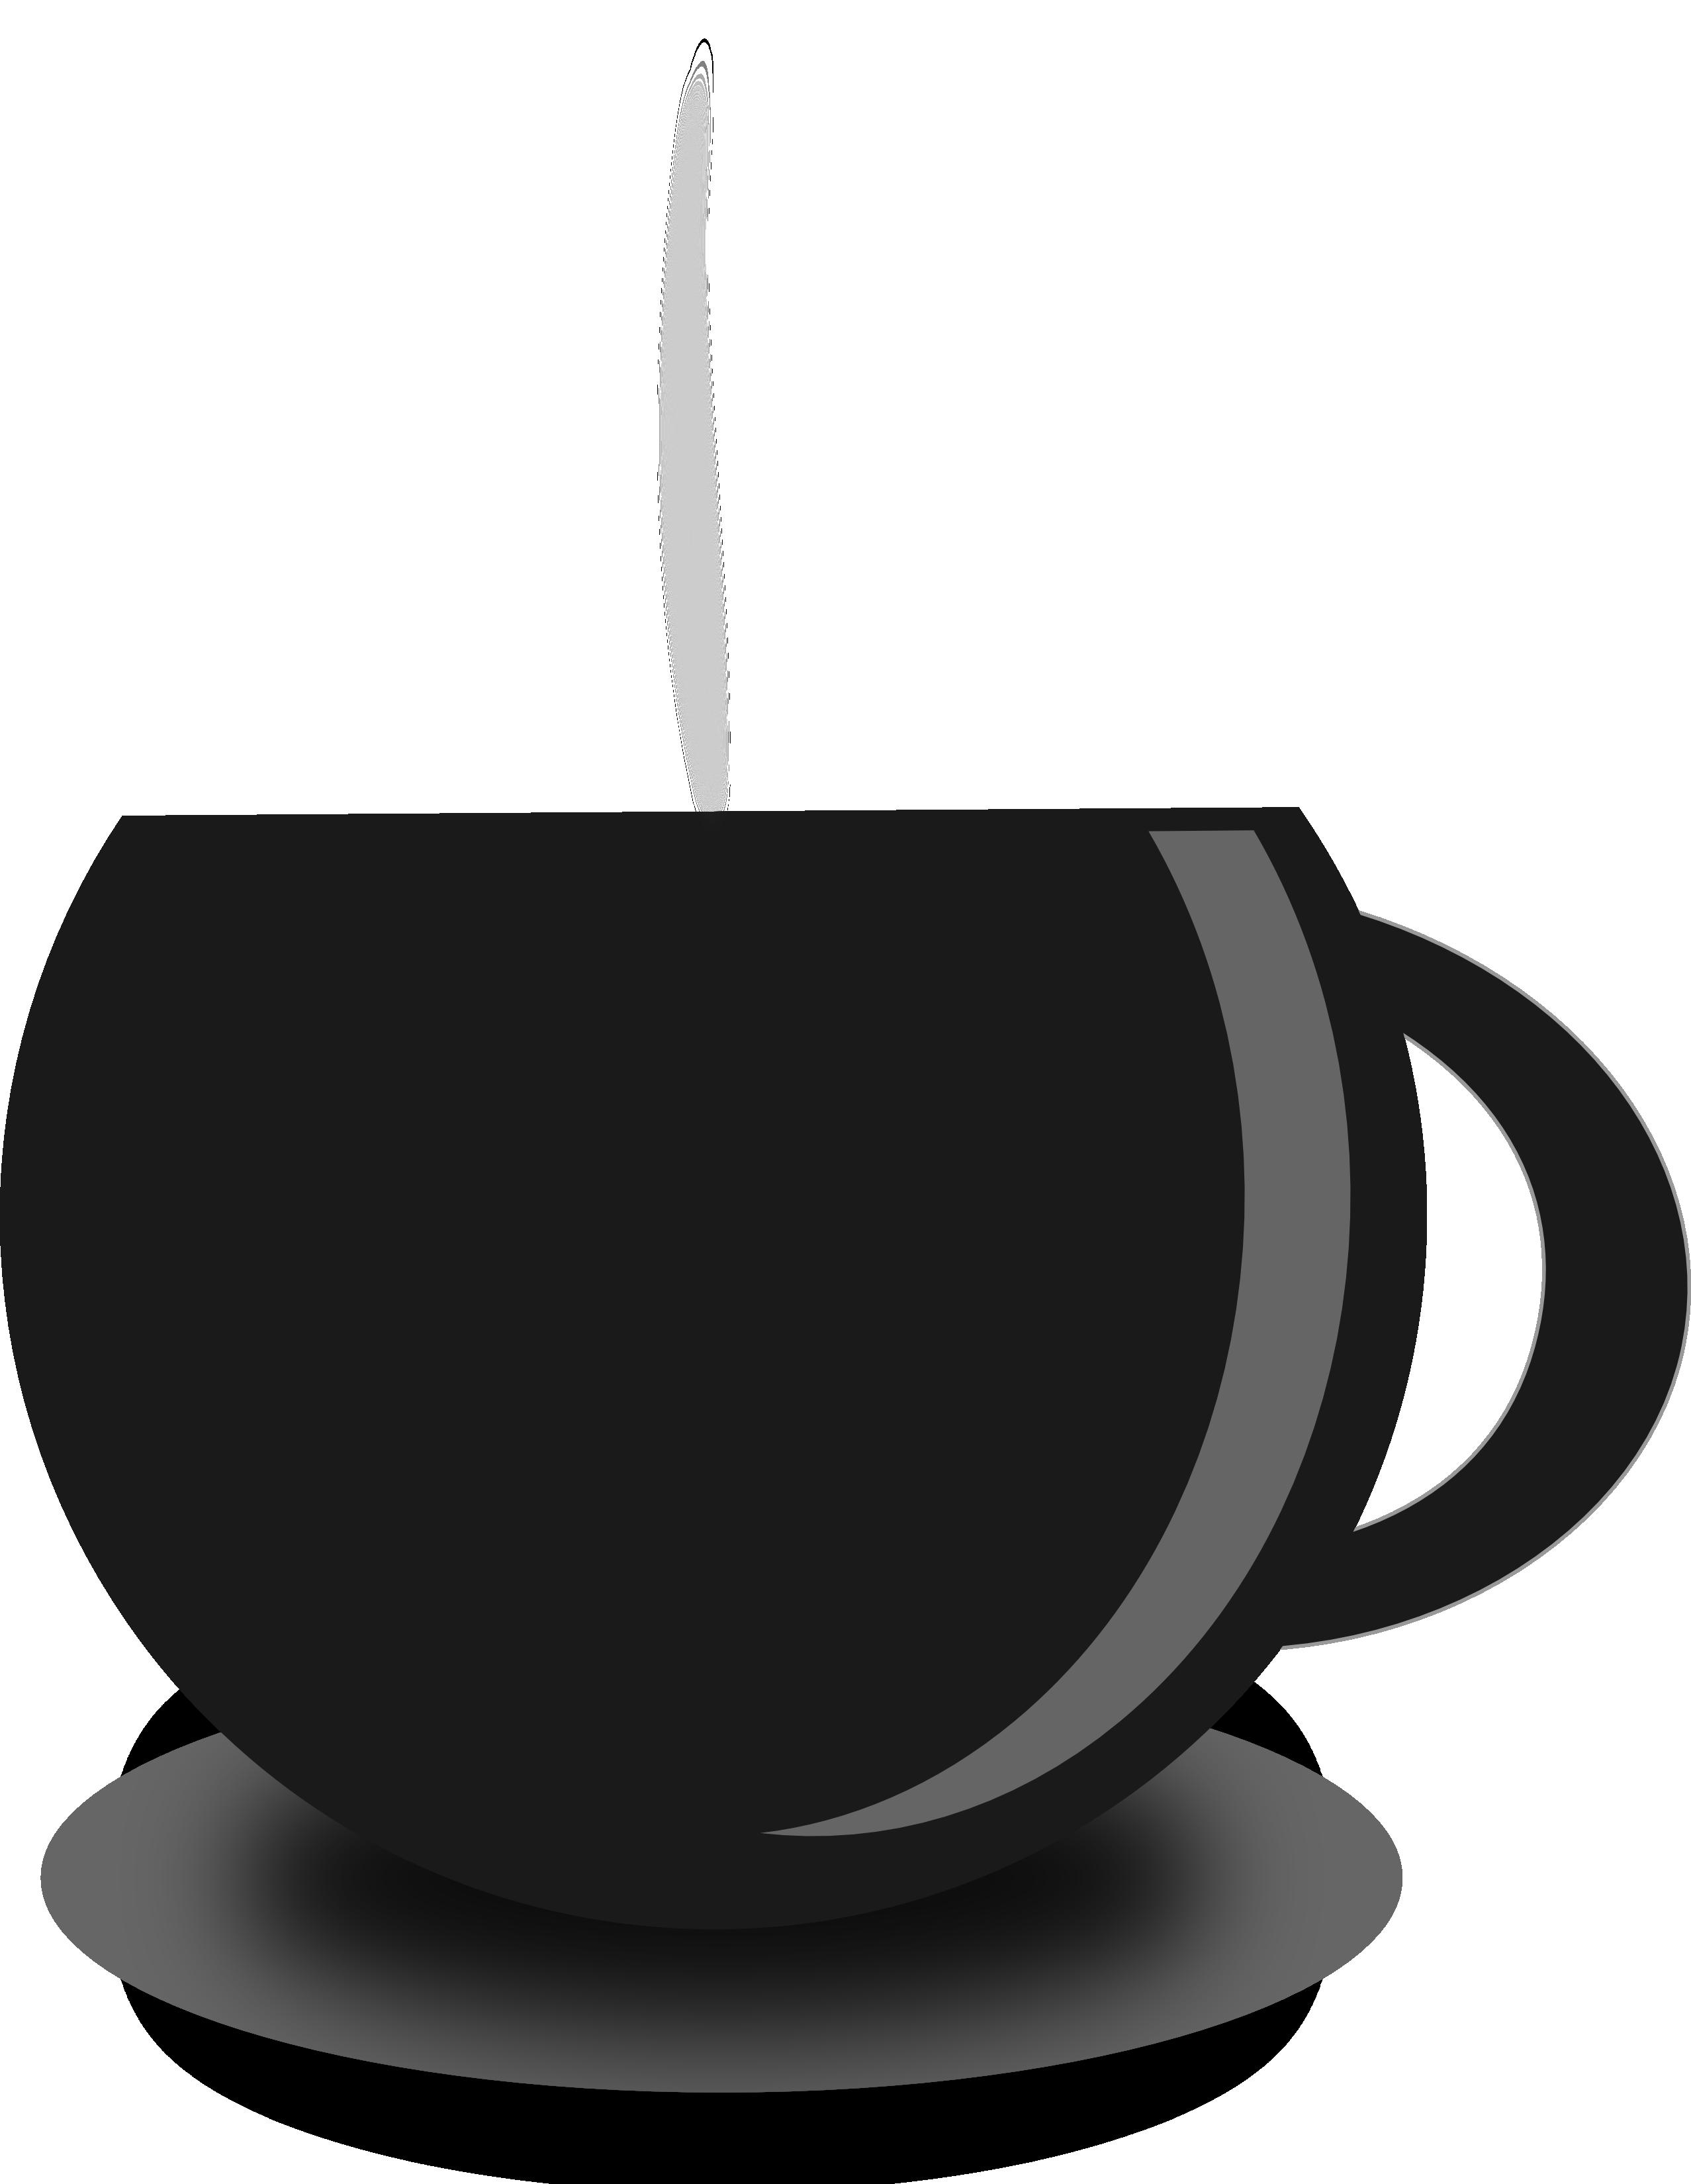 Cup clipart pyramid. Fancy teacup clip art